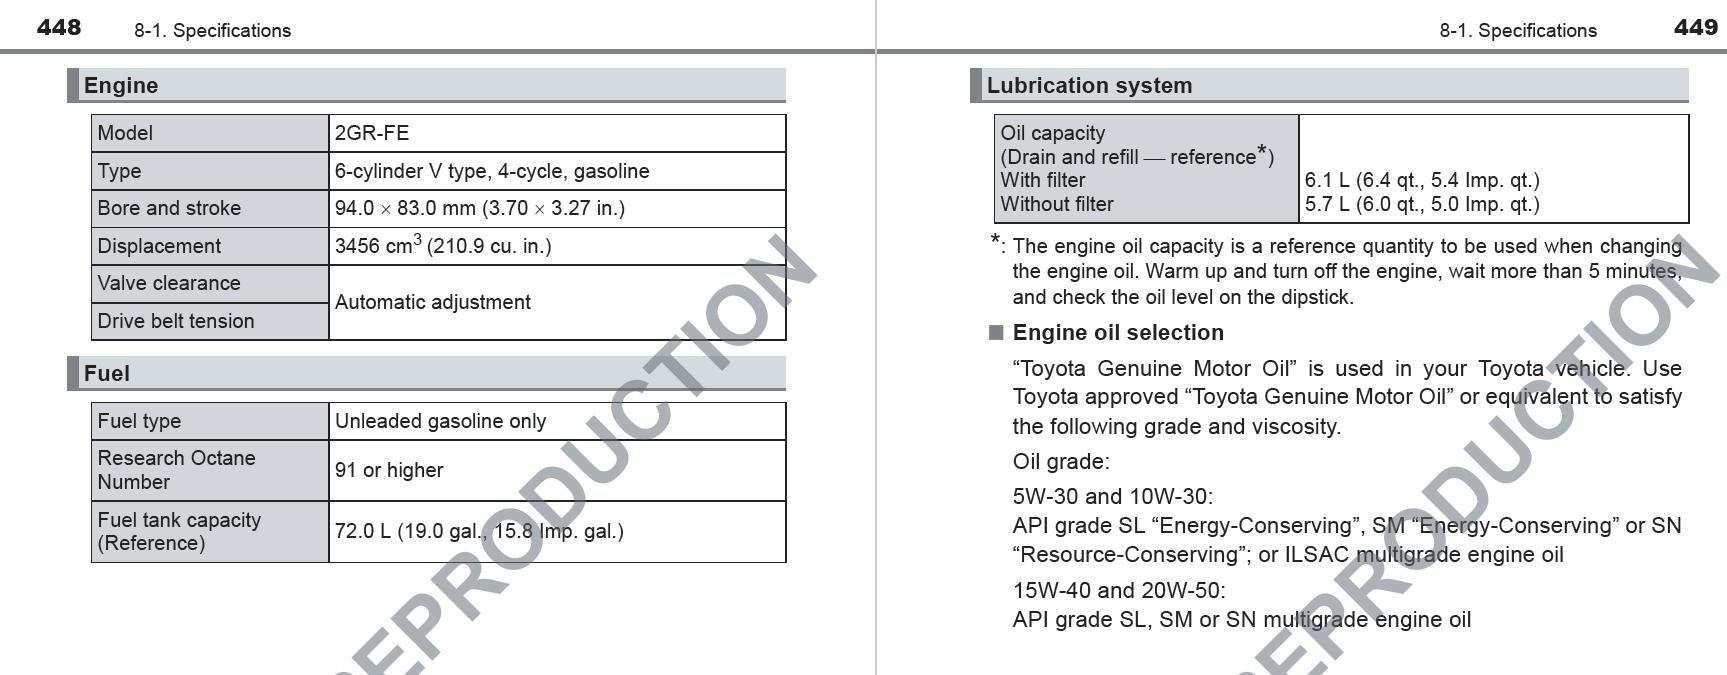 Toyota Sienna Service Manual: 2Gr-fe lubrication